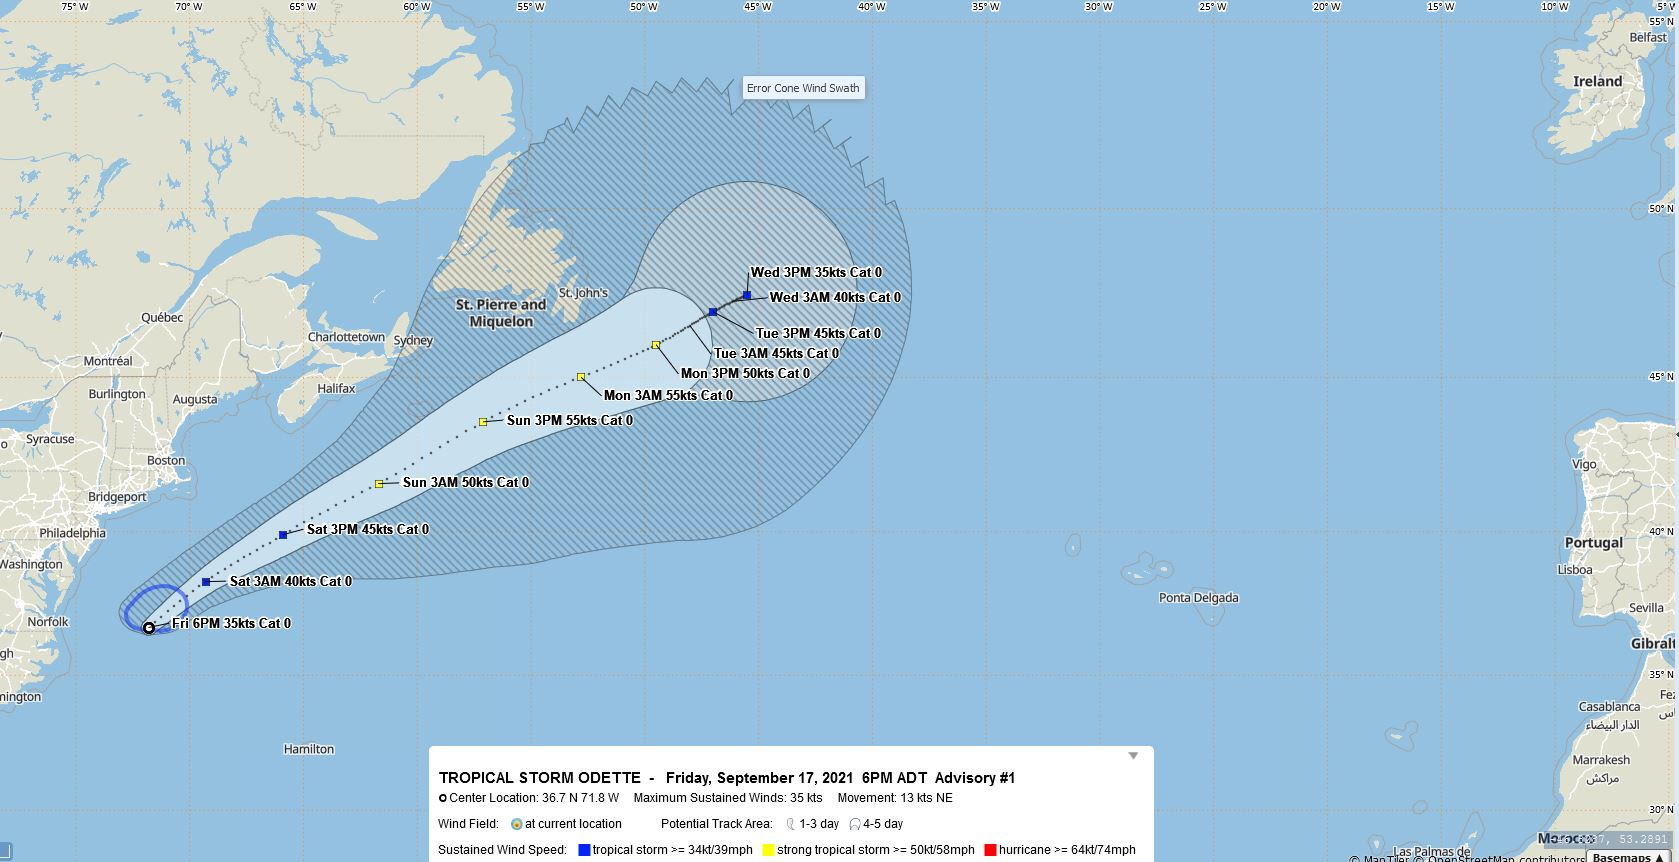 Impact on Bermuda